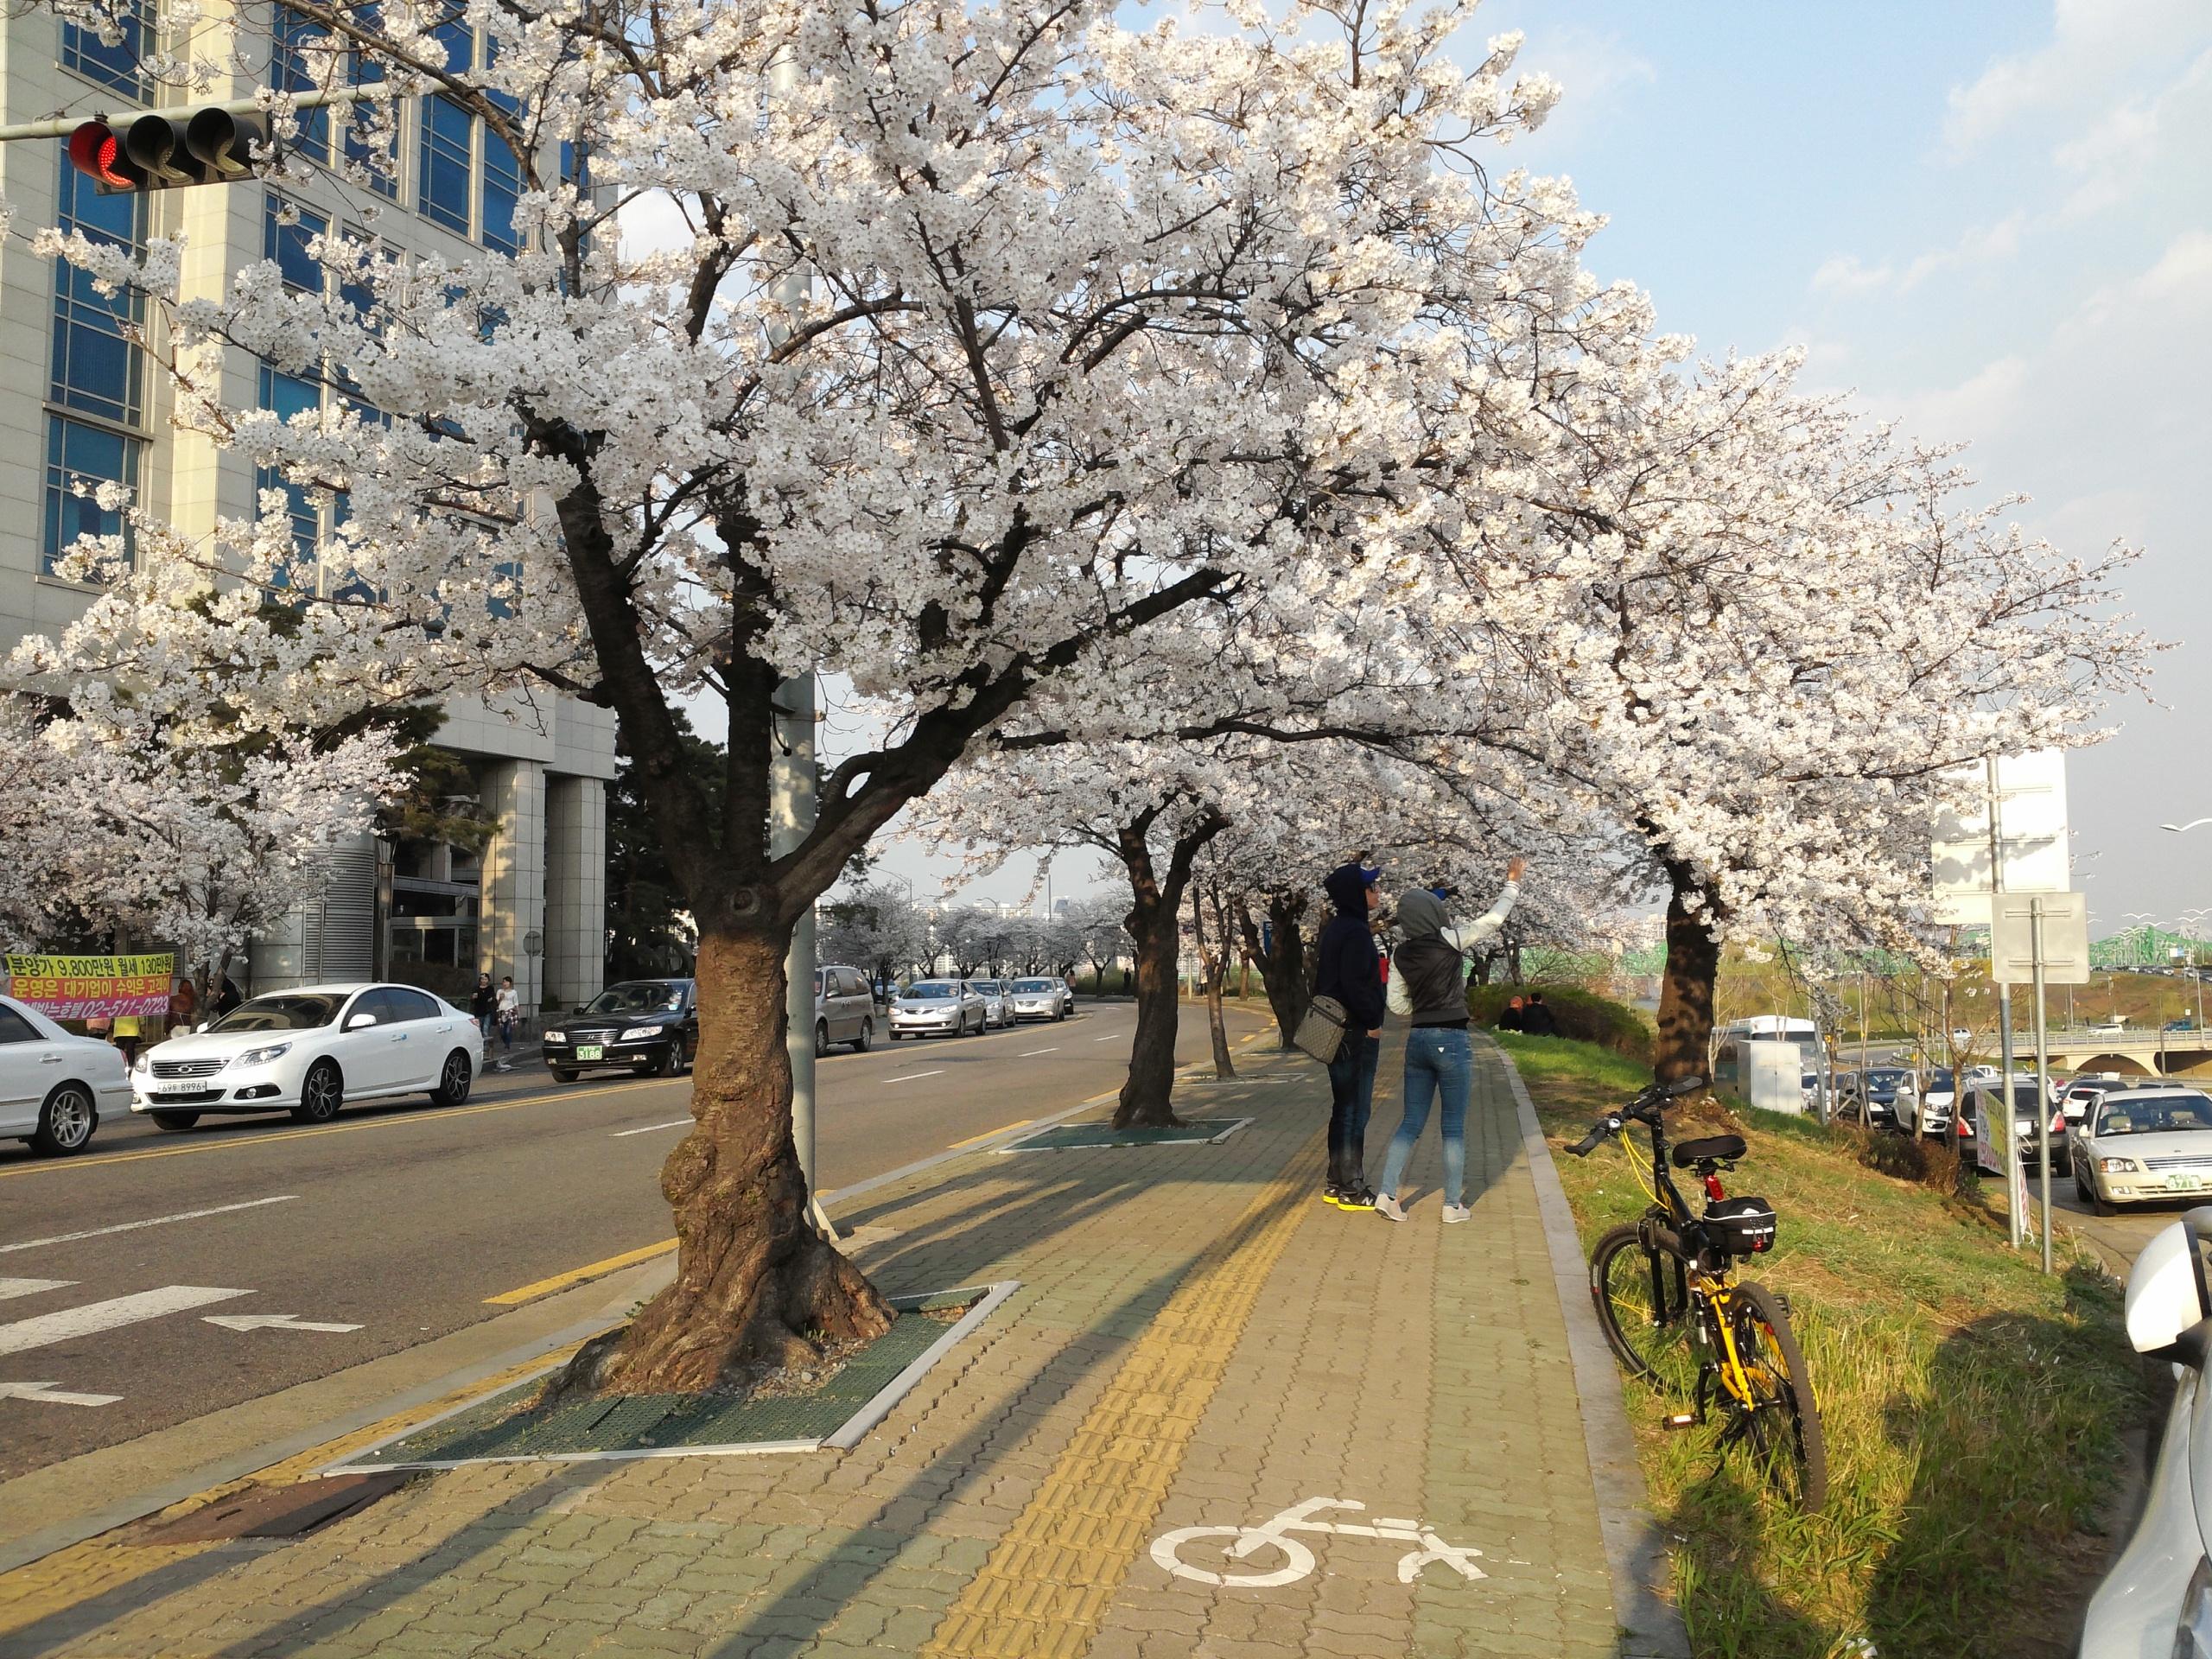 20140330_1732539.jpg : 벚꽃이 피었습니다.